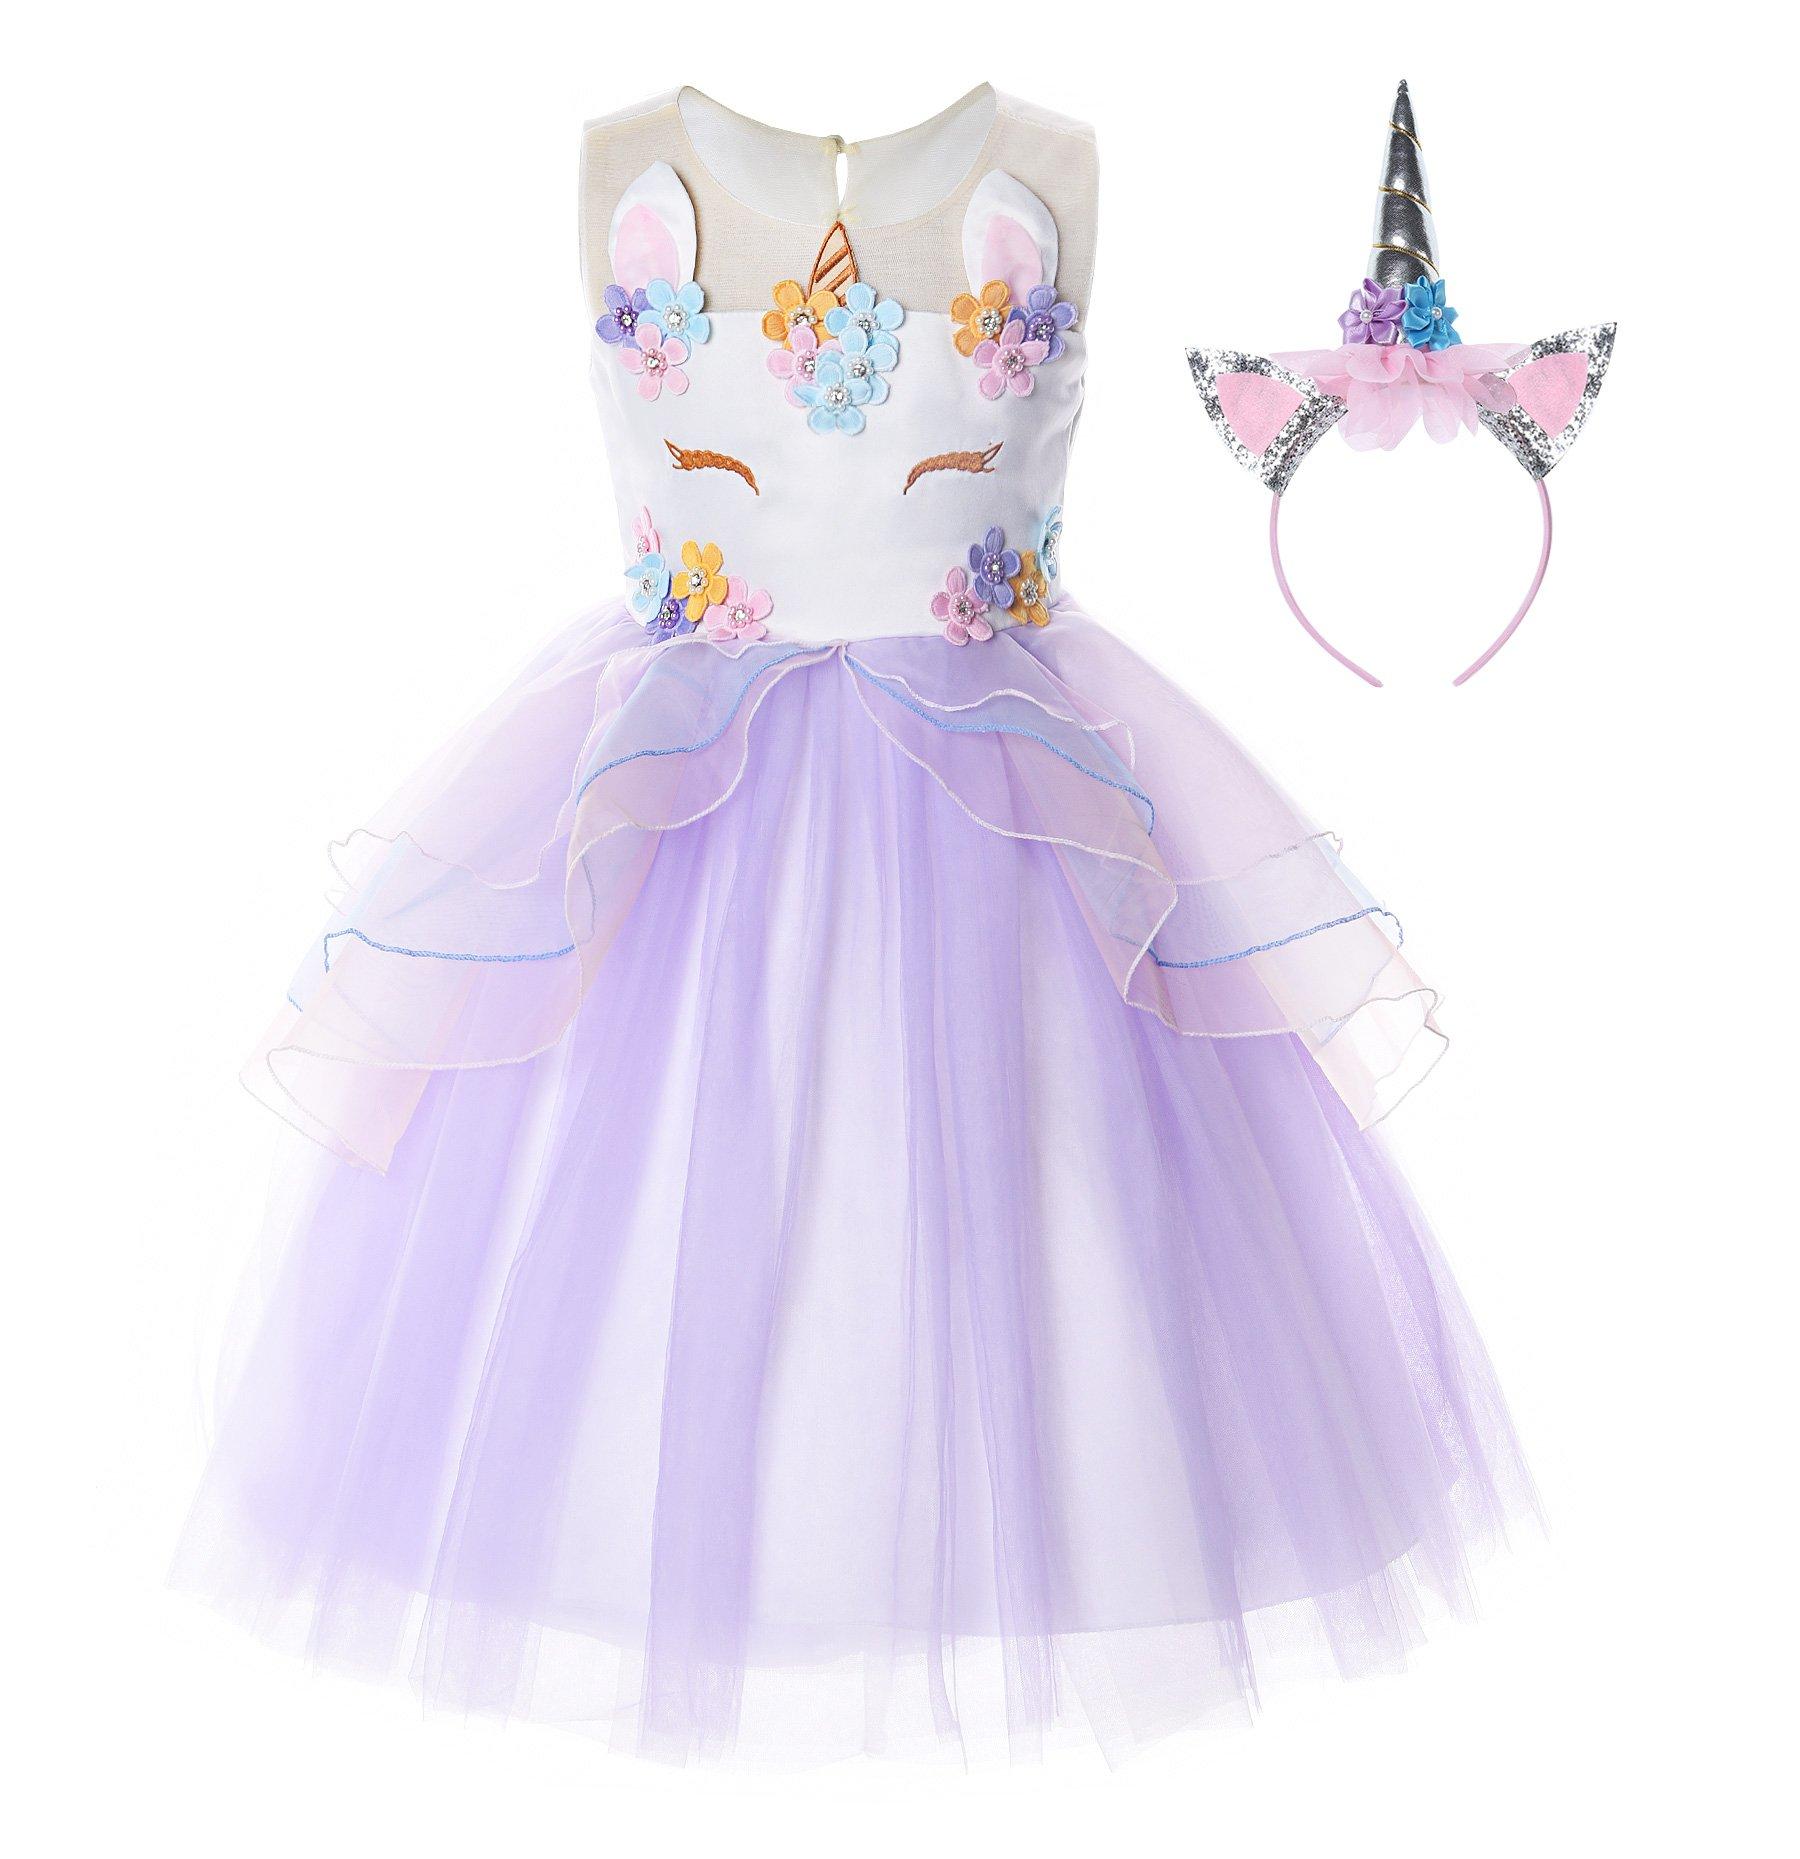 JerrisApparel Flower Girls Unicorn Costume Pageant Princess Party Dress (8-9 Years, Purple)